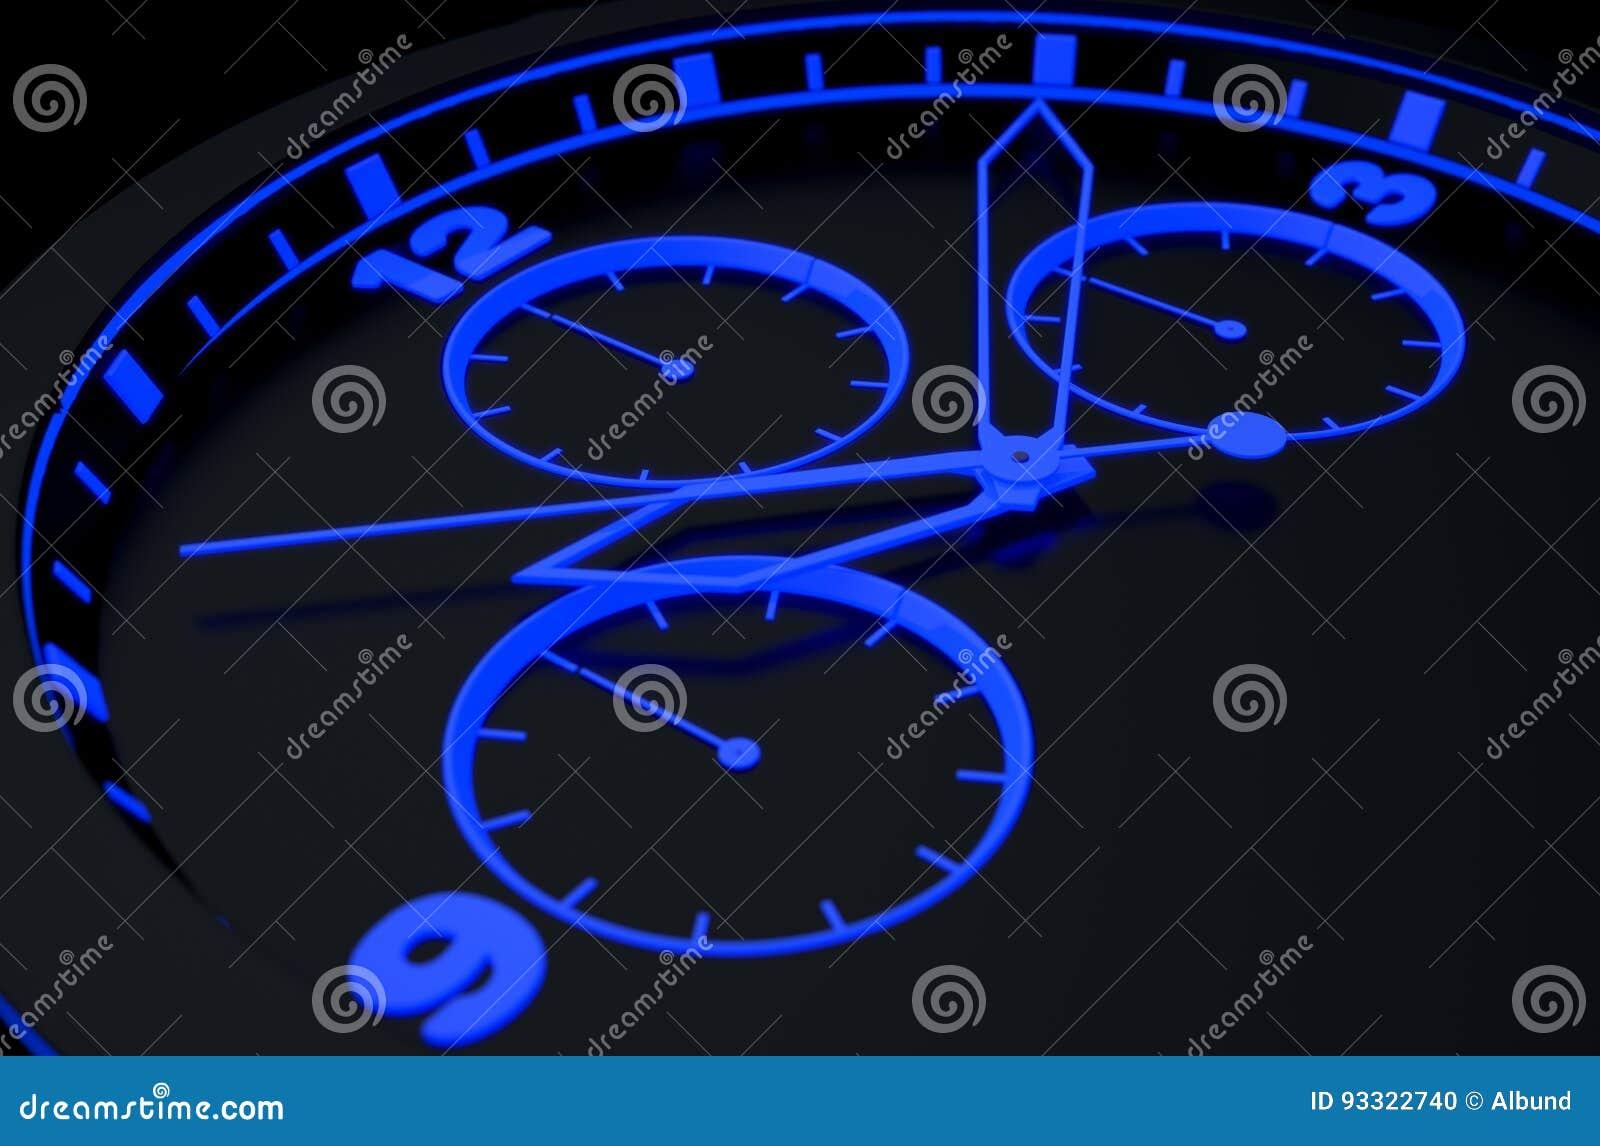 Neon Watch Face Stock Photo Cartoondealer Com 93322740